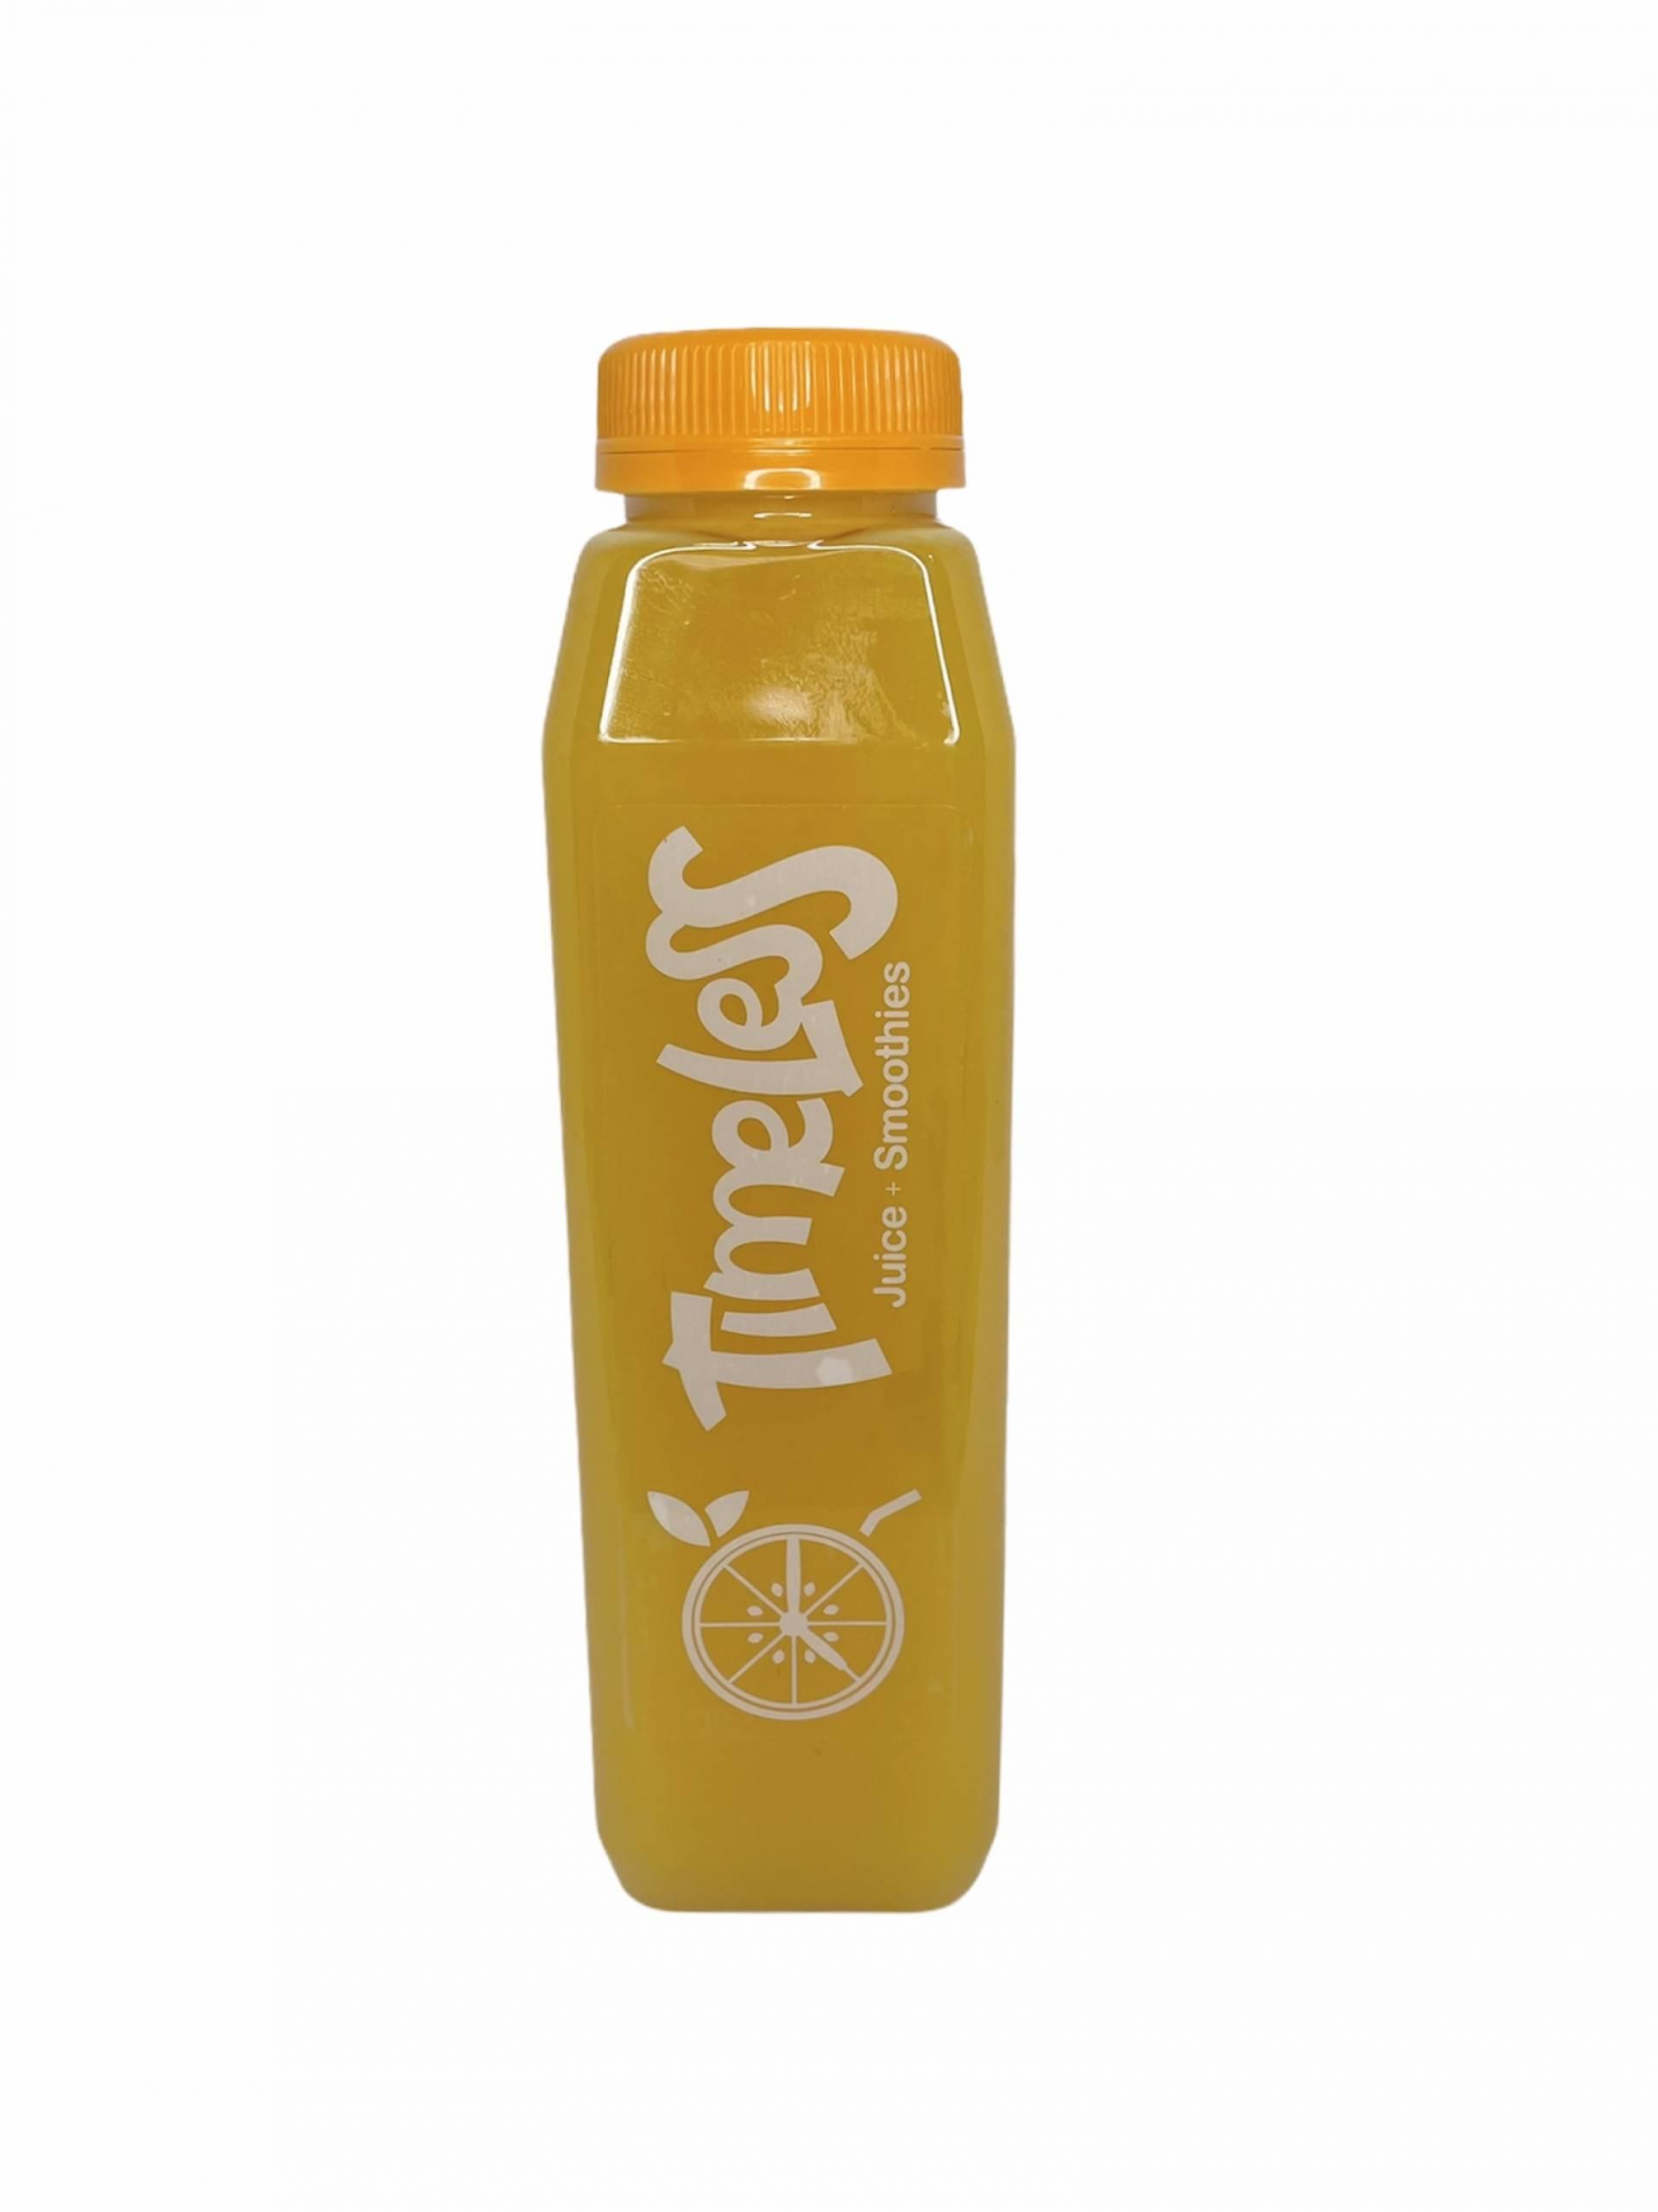 Timeless Juice - Citrus Delight